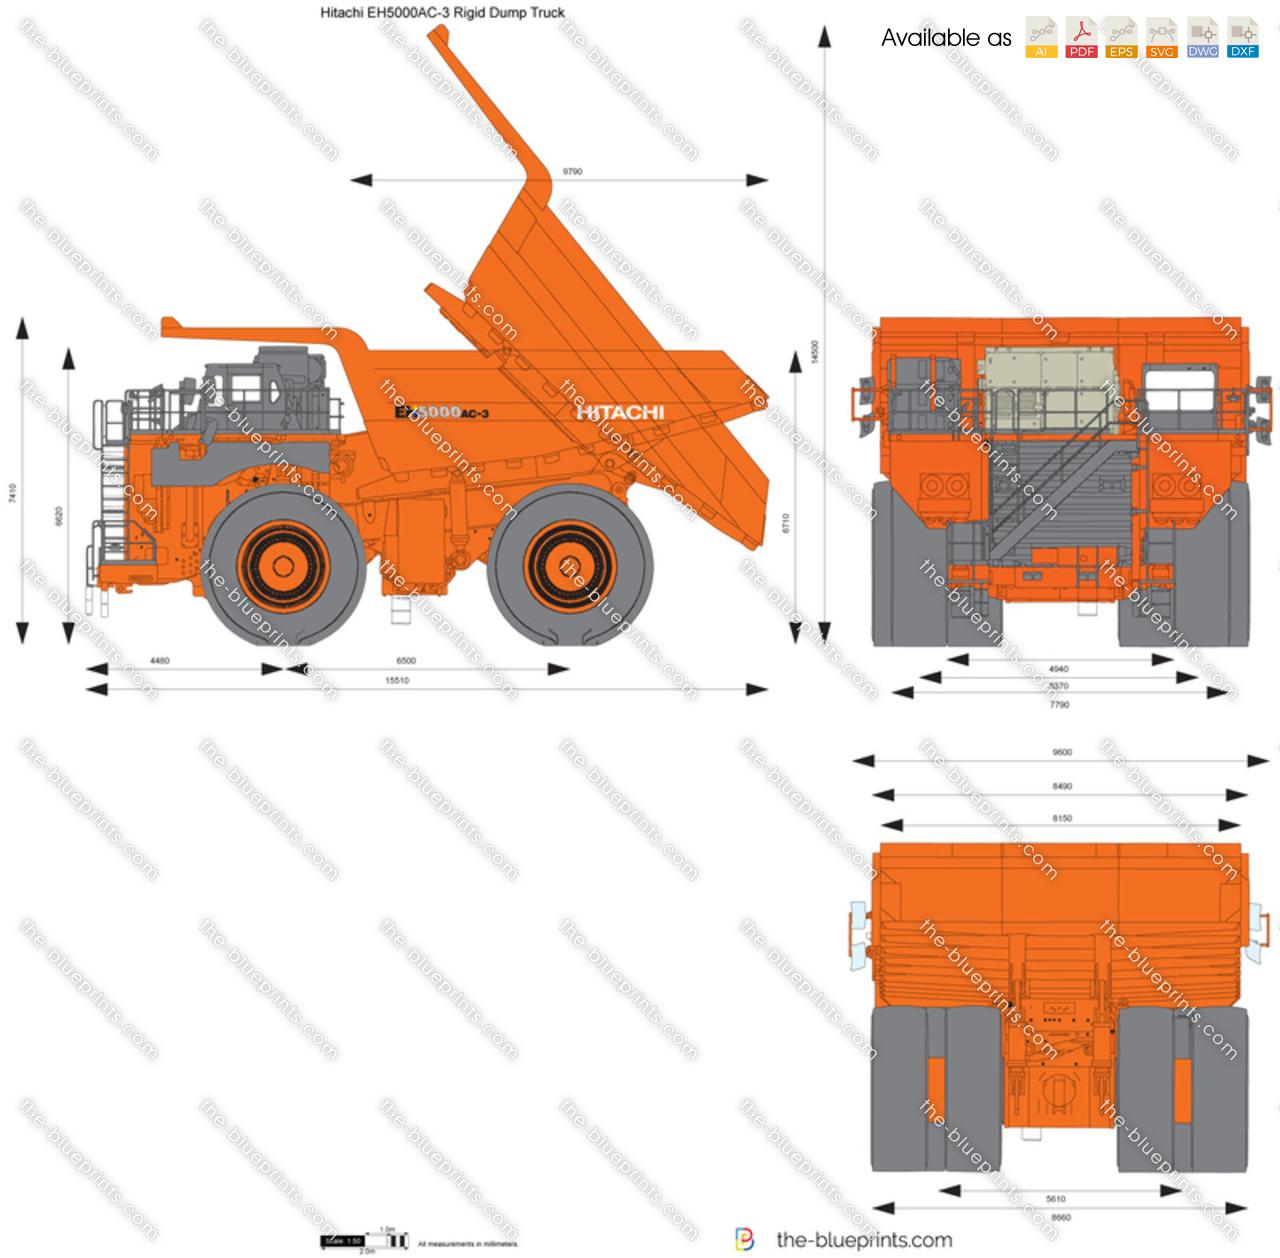 Hitachi EH5000AC-3 Rigid Dump Truck